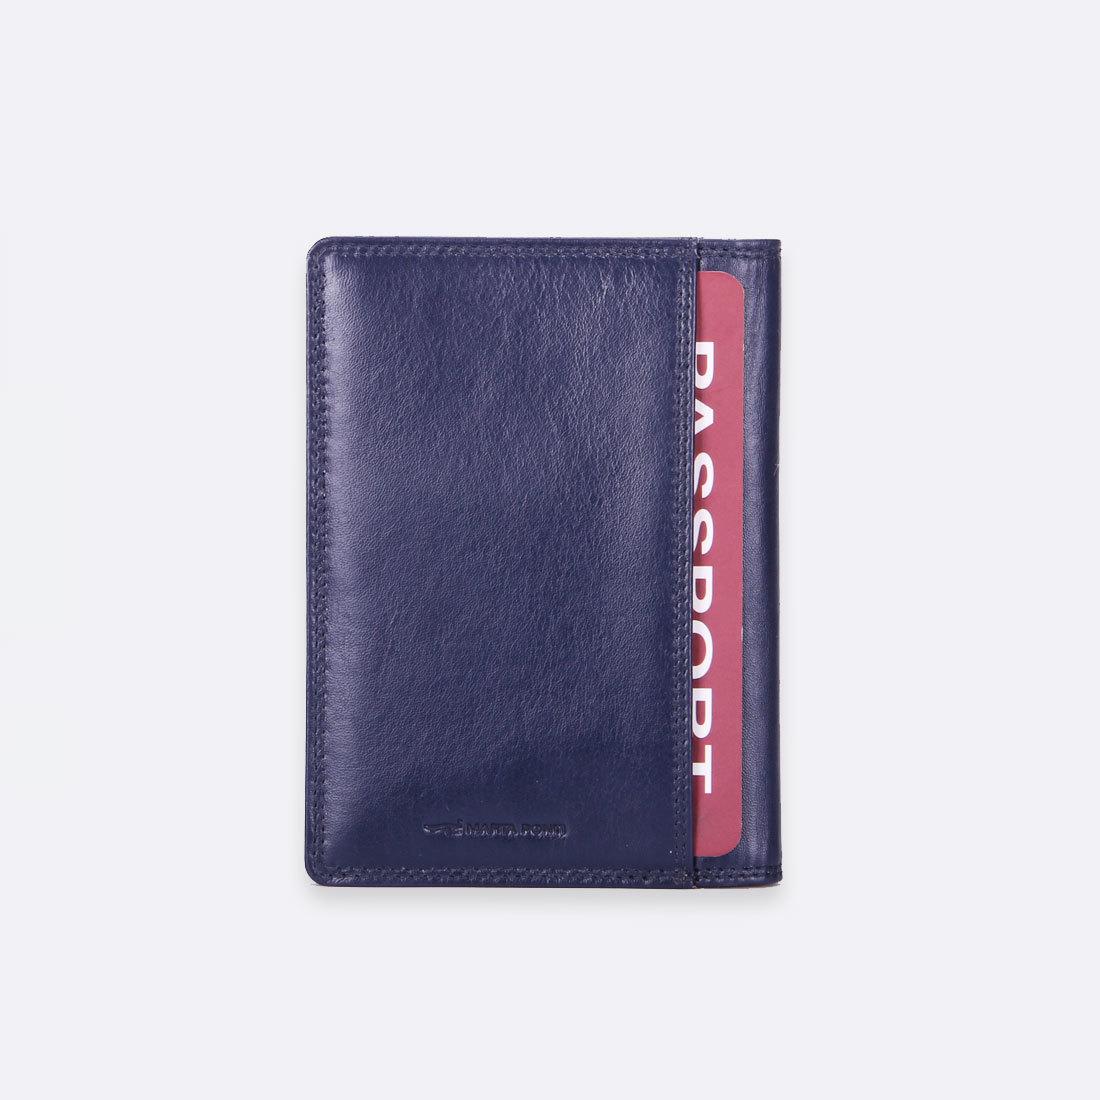 B270047 Murano P - Обложка для паспорта Marta Ponti